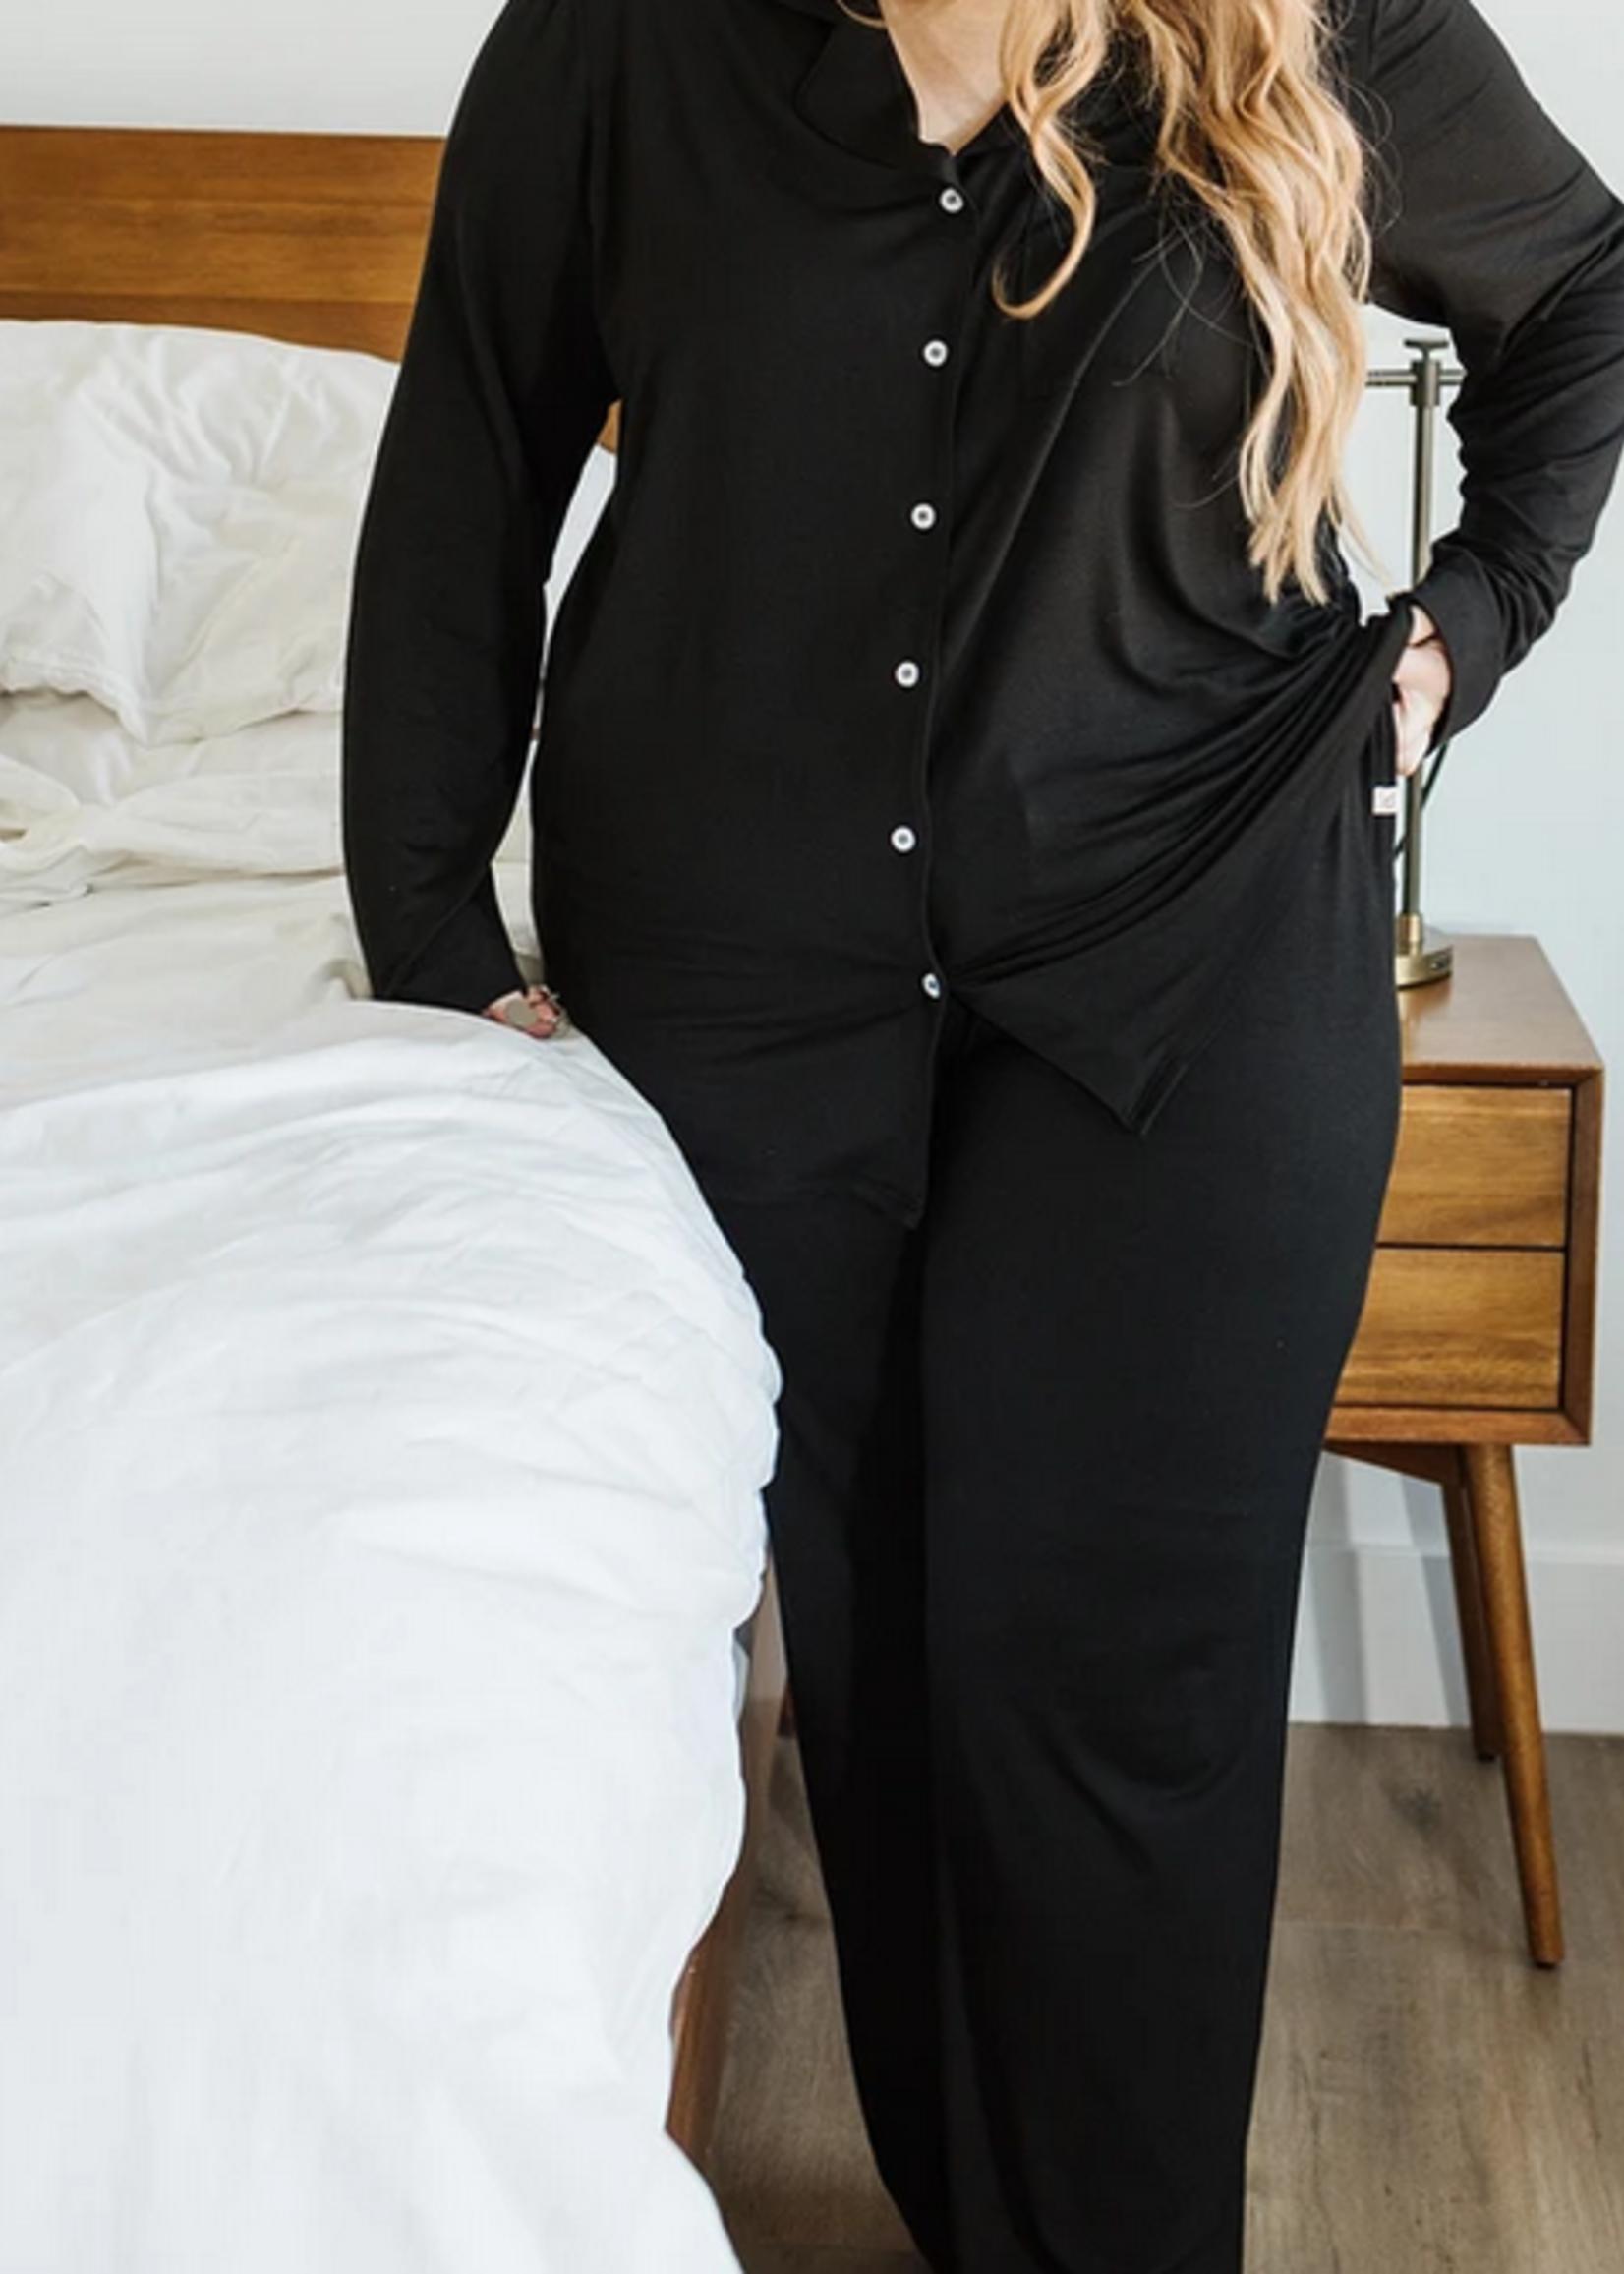 Elitaire Petite Long Sleeve Dream Set in Black